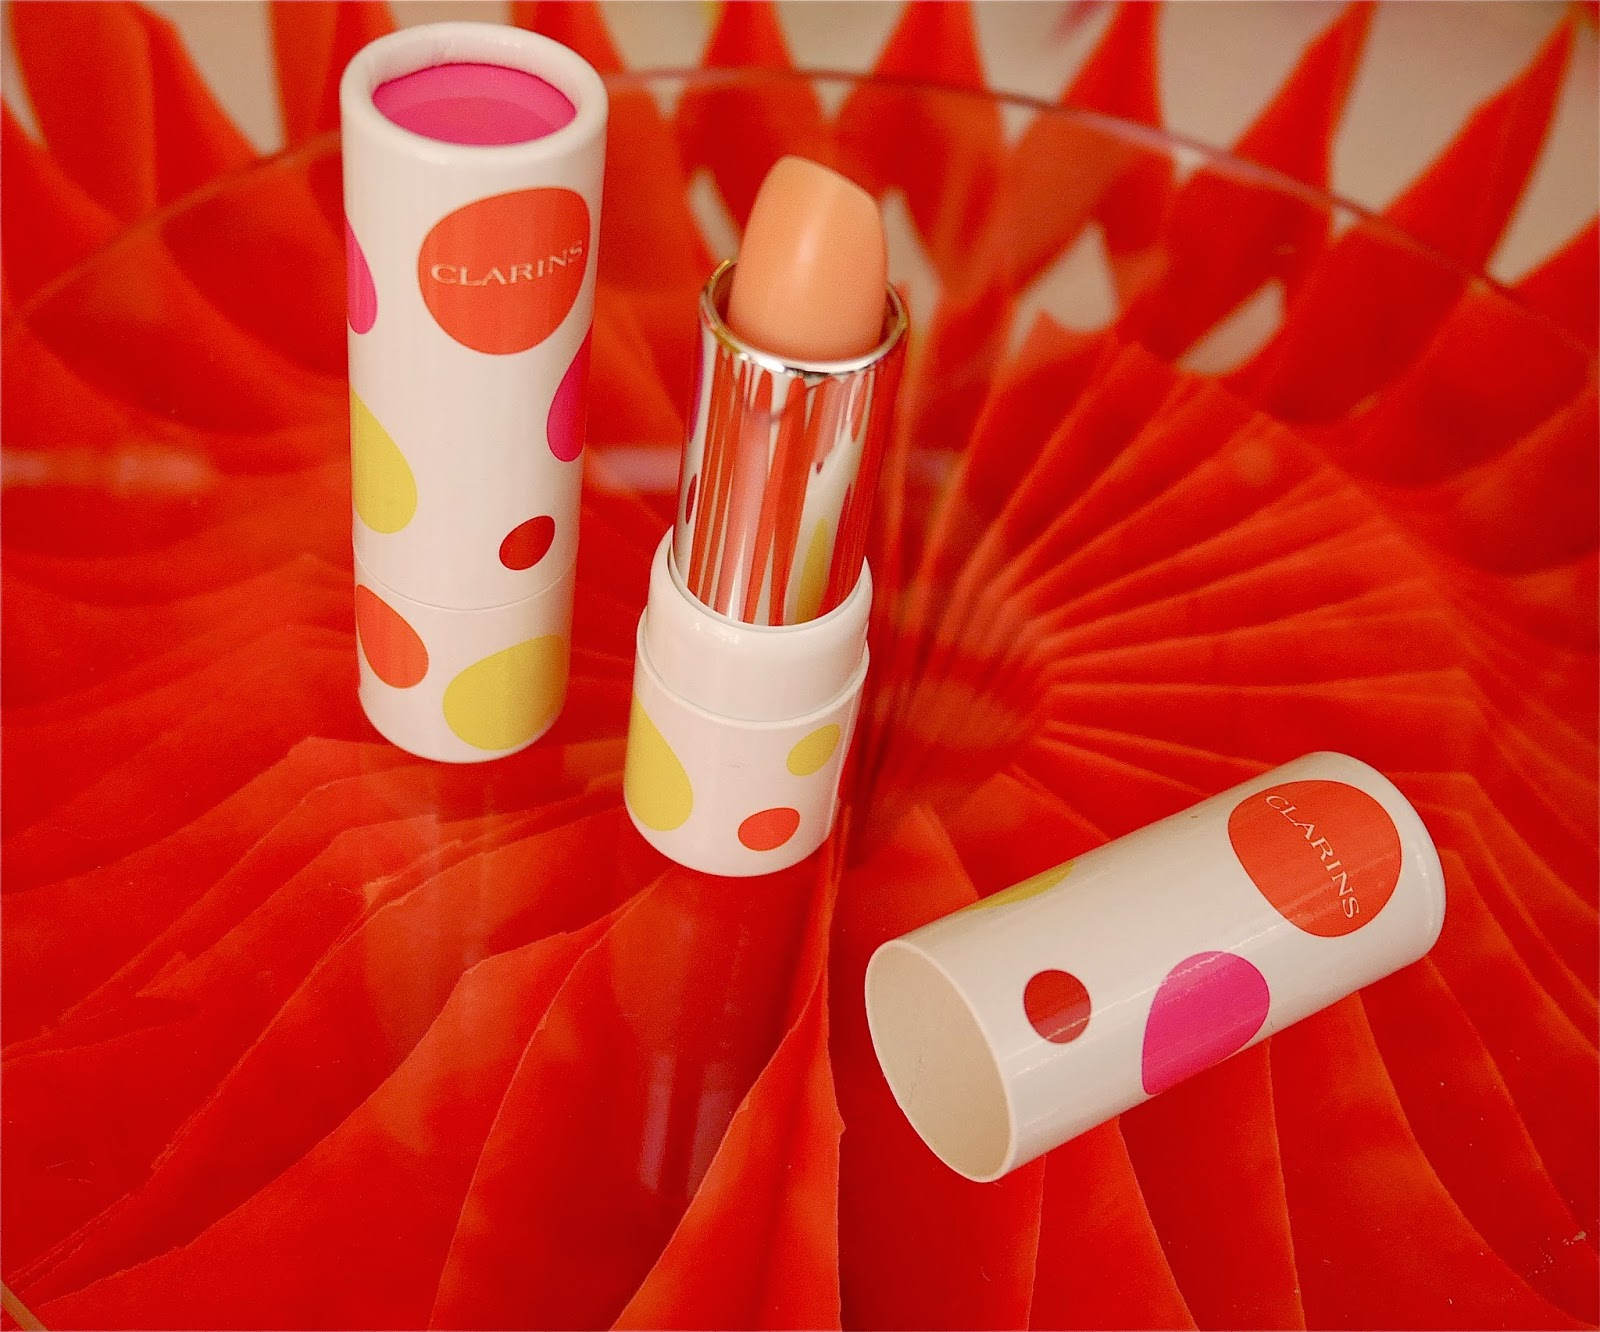 rebondi, pink, baume clarins, stick à lèvres, cosmeto factory, blog